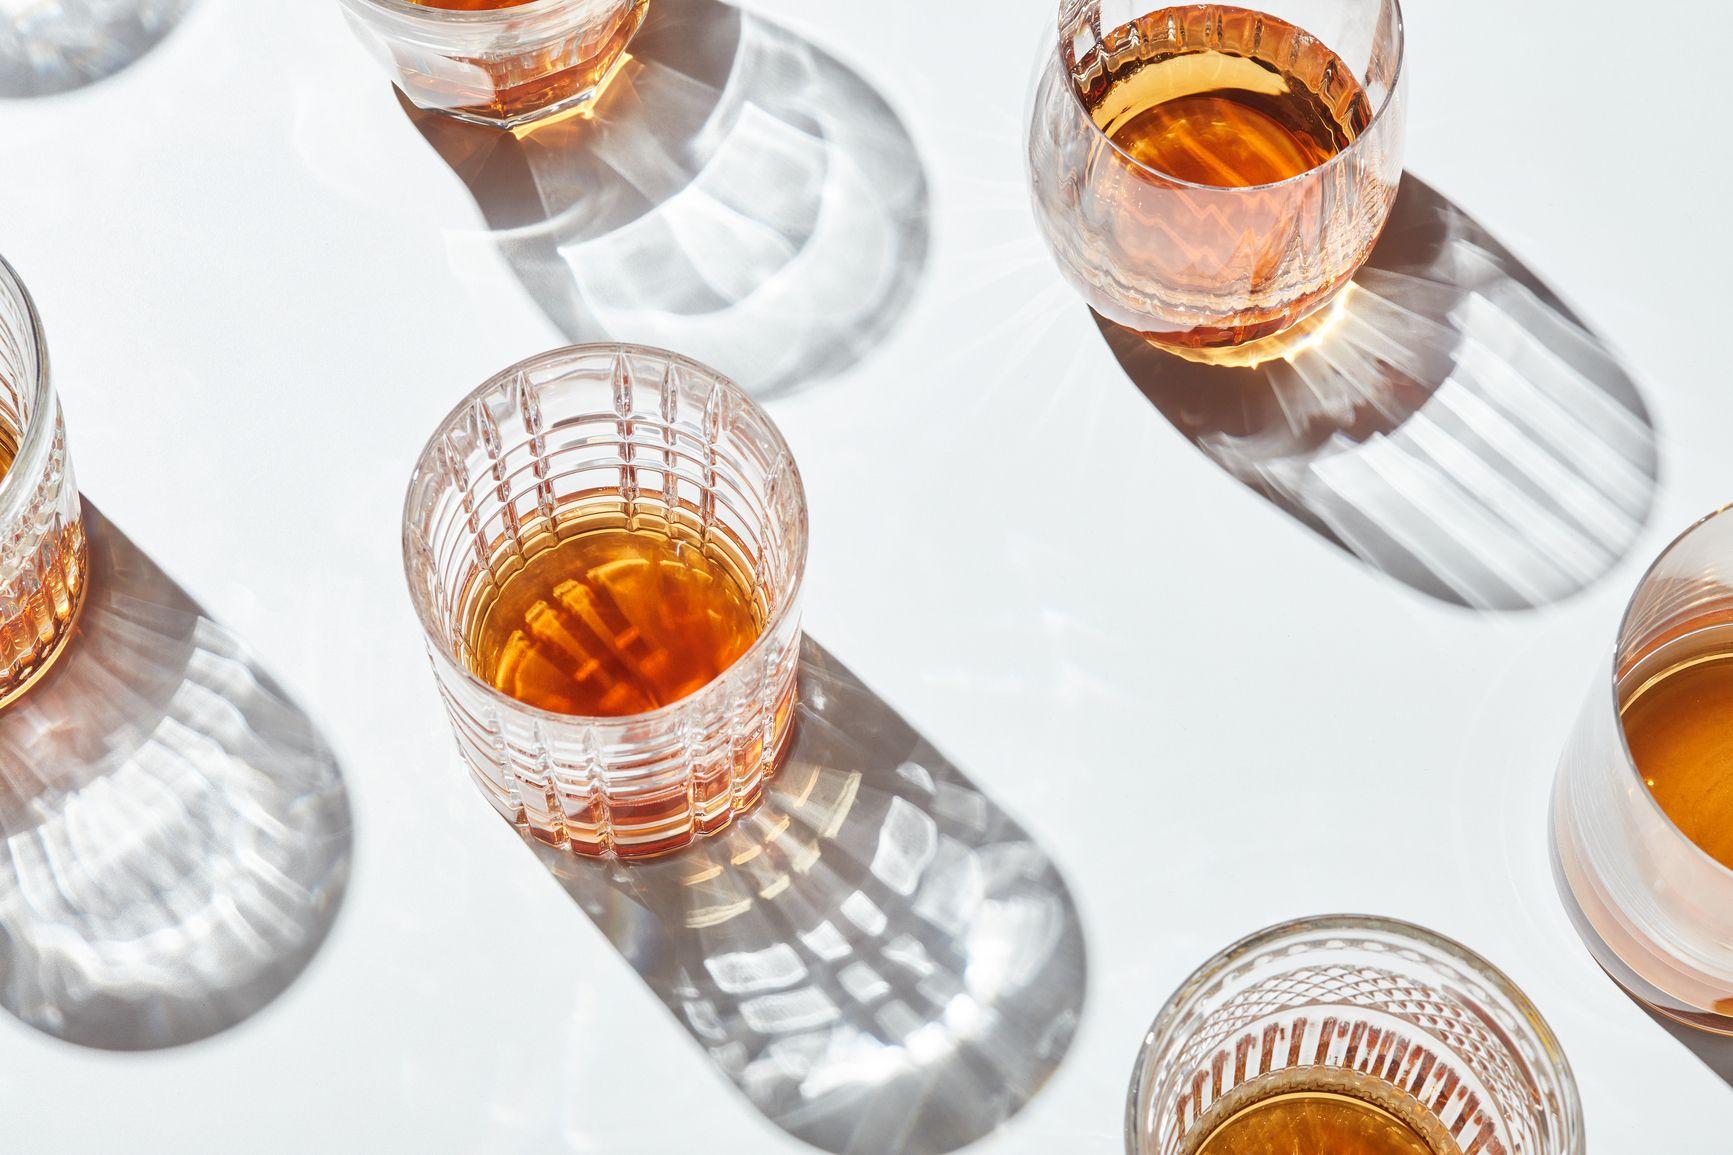 14 Best Drinkware Sets 2021 Stylish Everyday Drinking Glasses